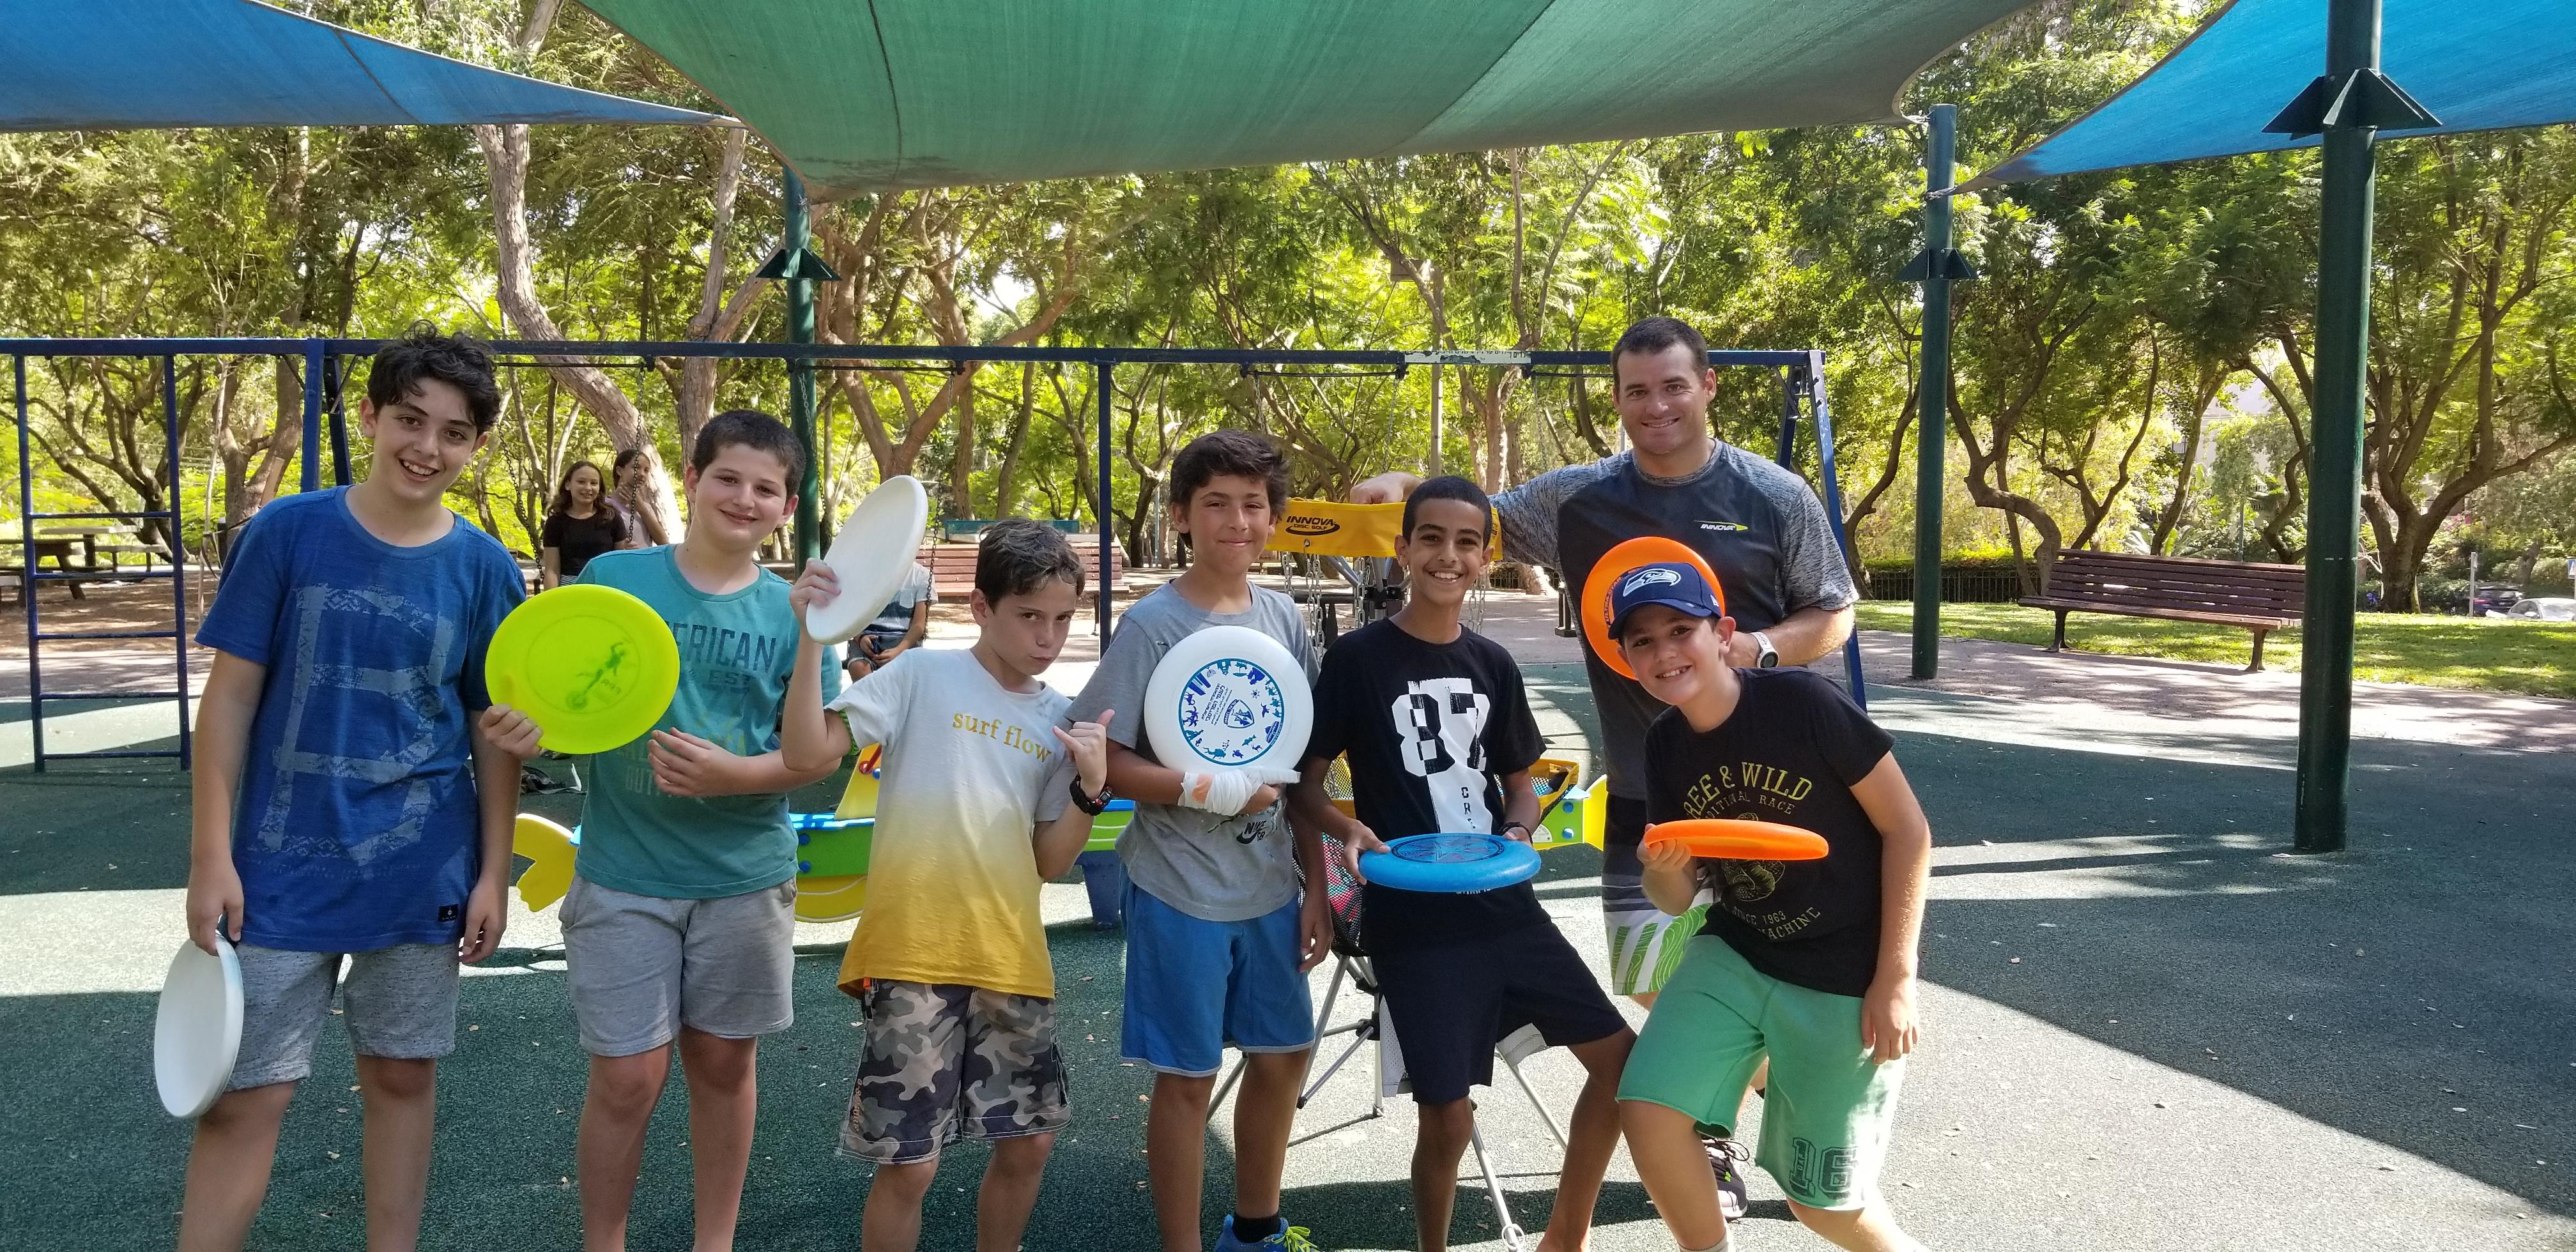 Israeli Playground Frisbee Trick Shots